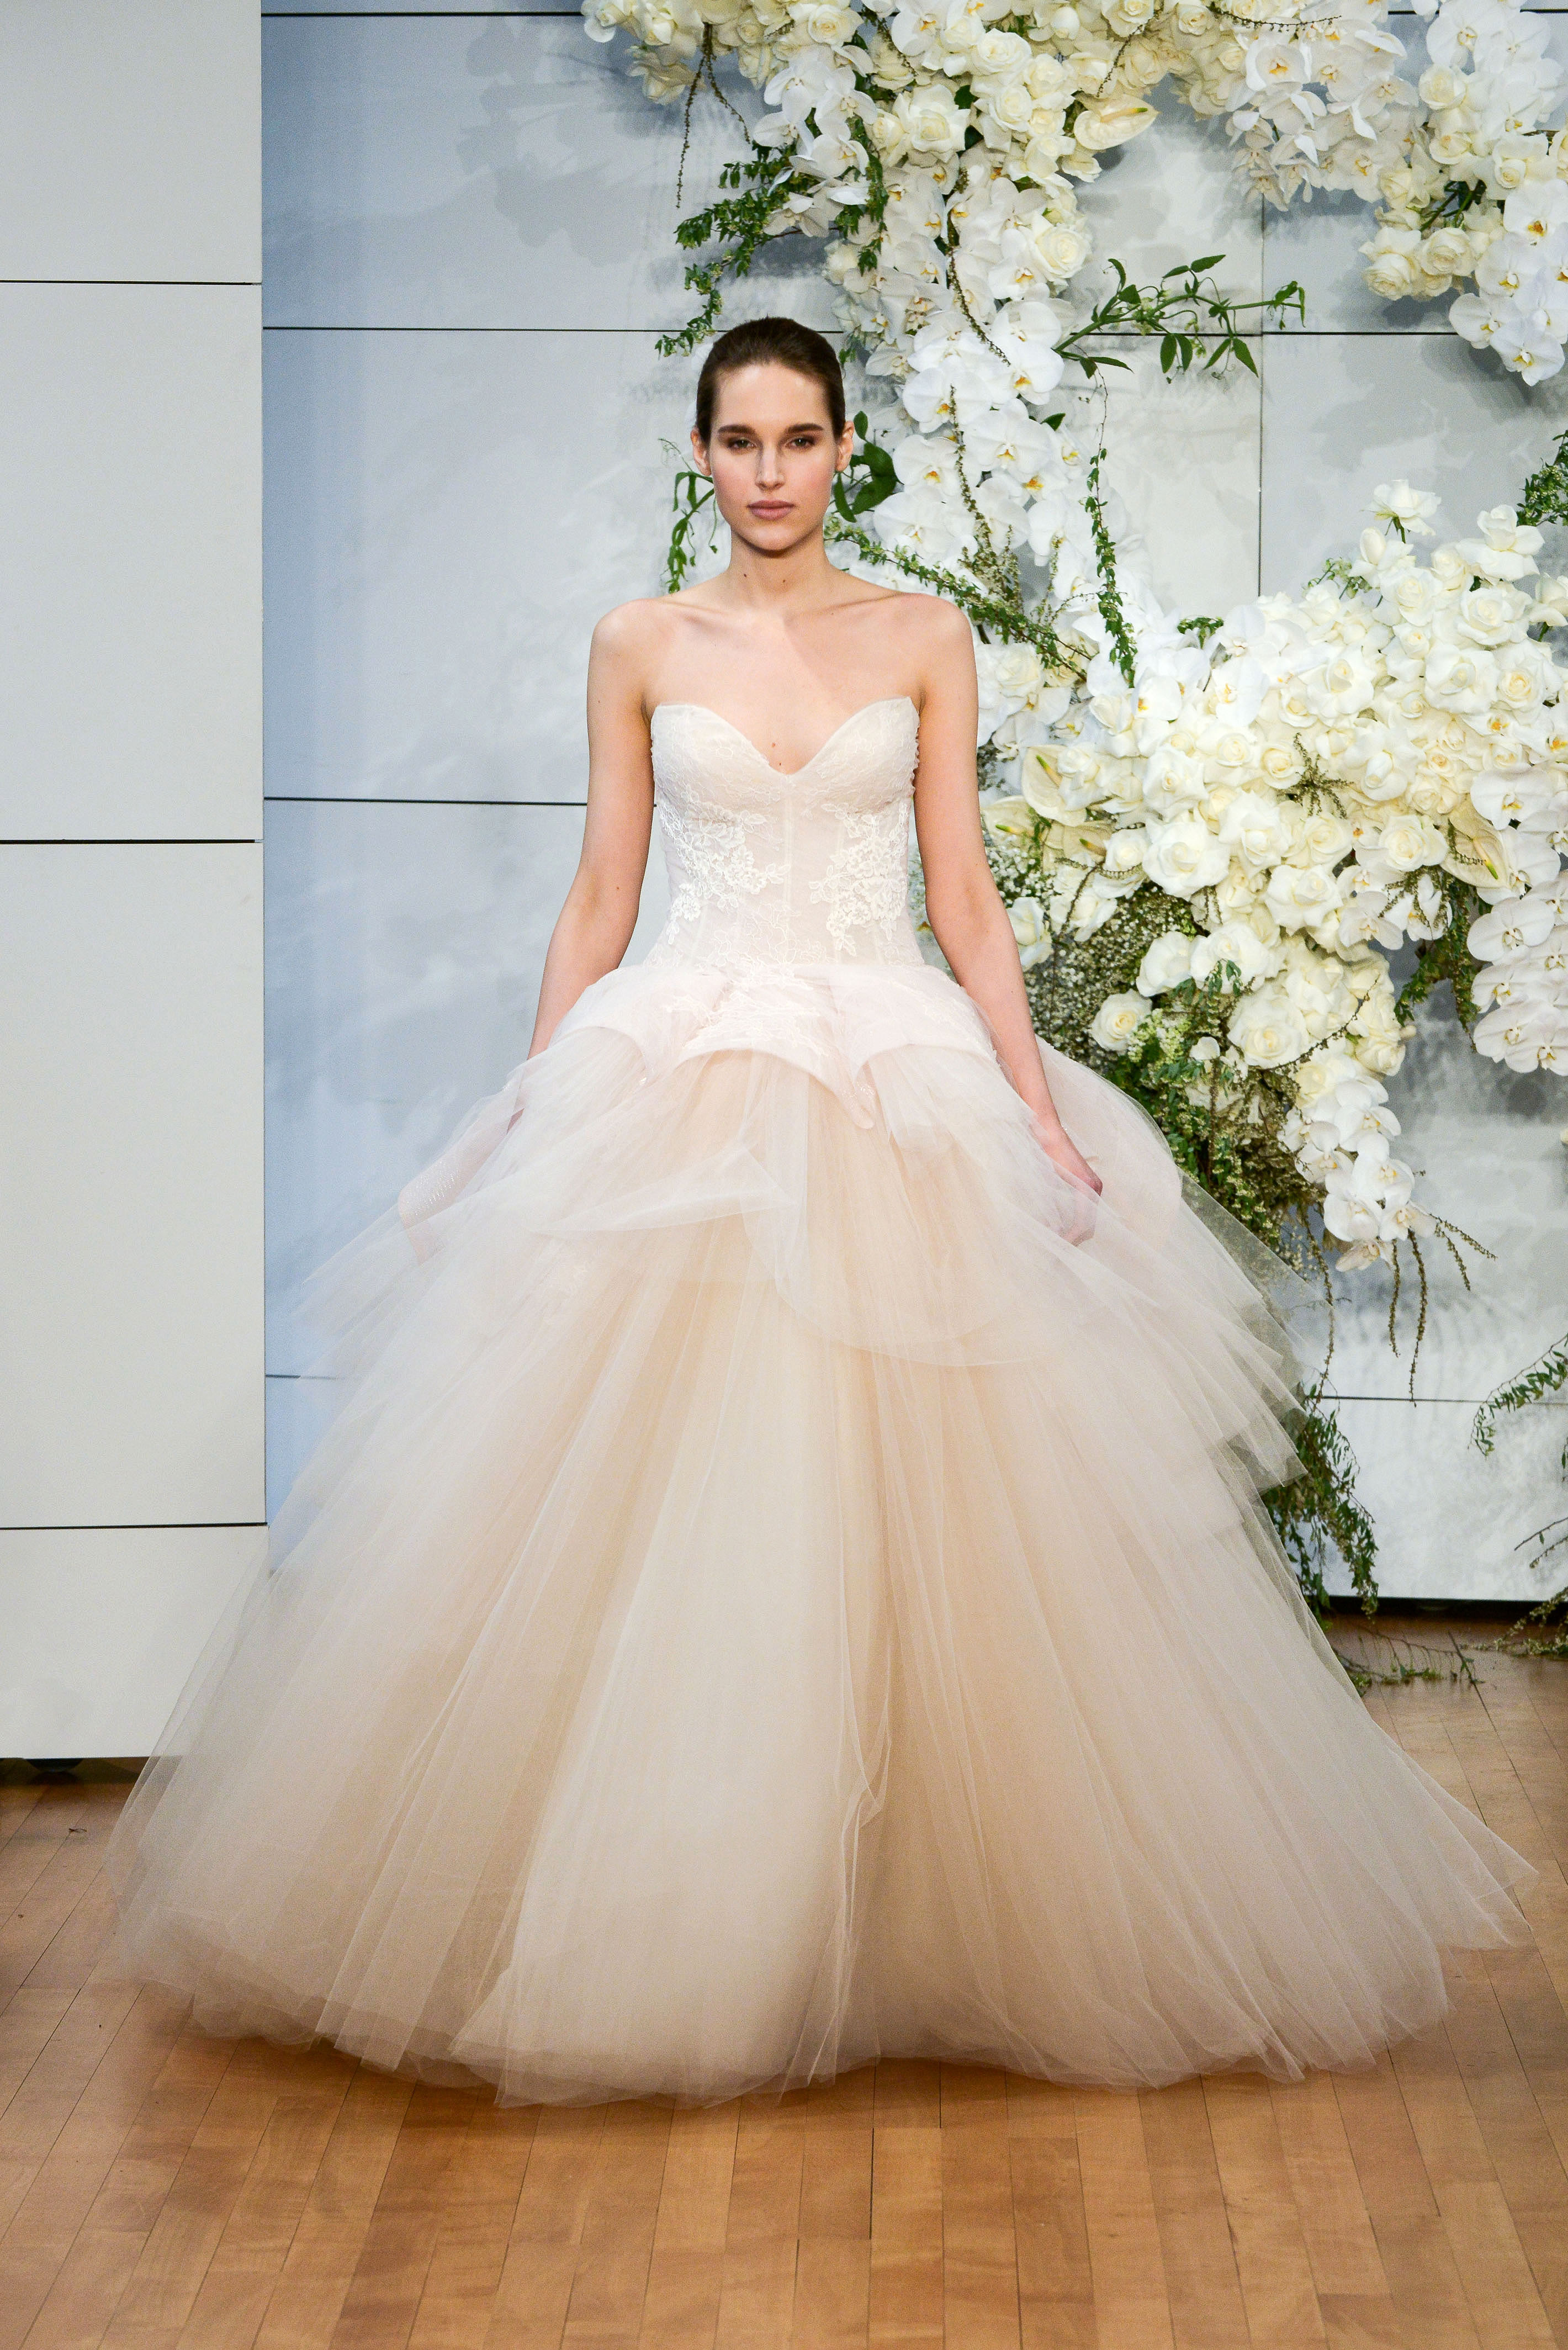 monique lhuillier sweet heart tulle ballgown wedding dress spring 2018